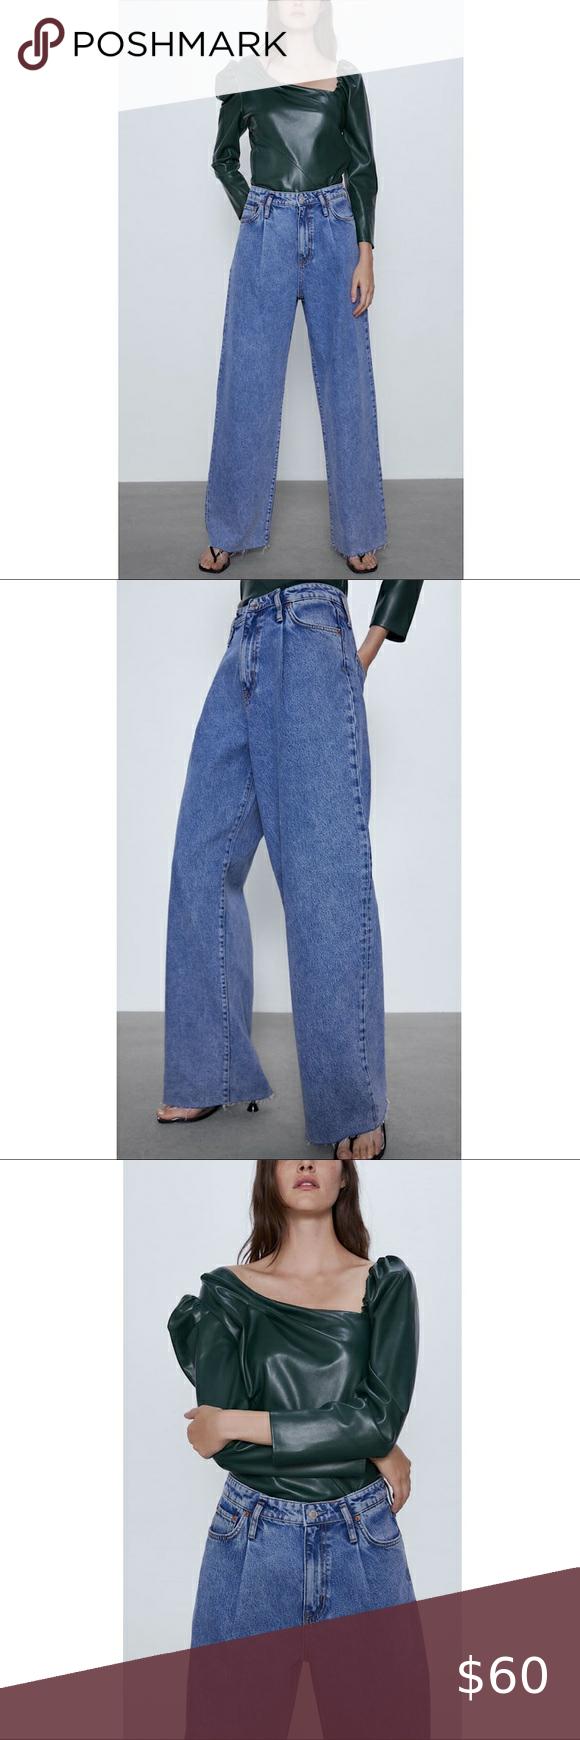 Zw Premium Caia Wide Leg Jeans Wide Leg Jeans Blue High Waisted Jeans High Waist Jeans